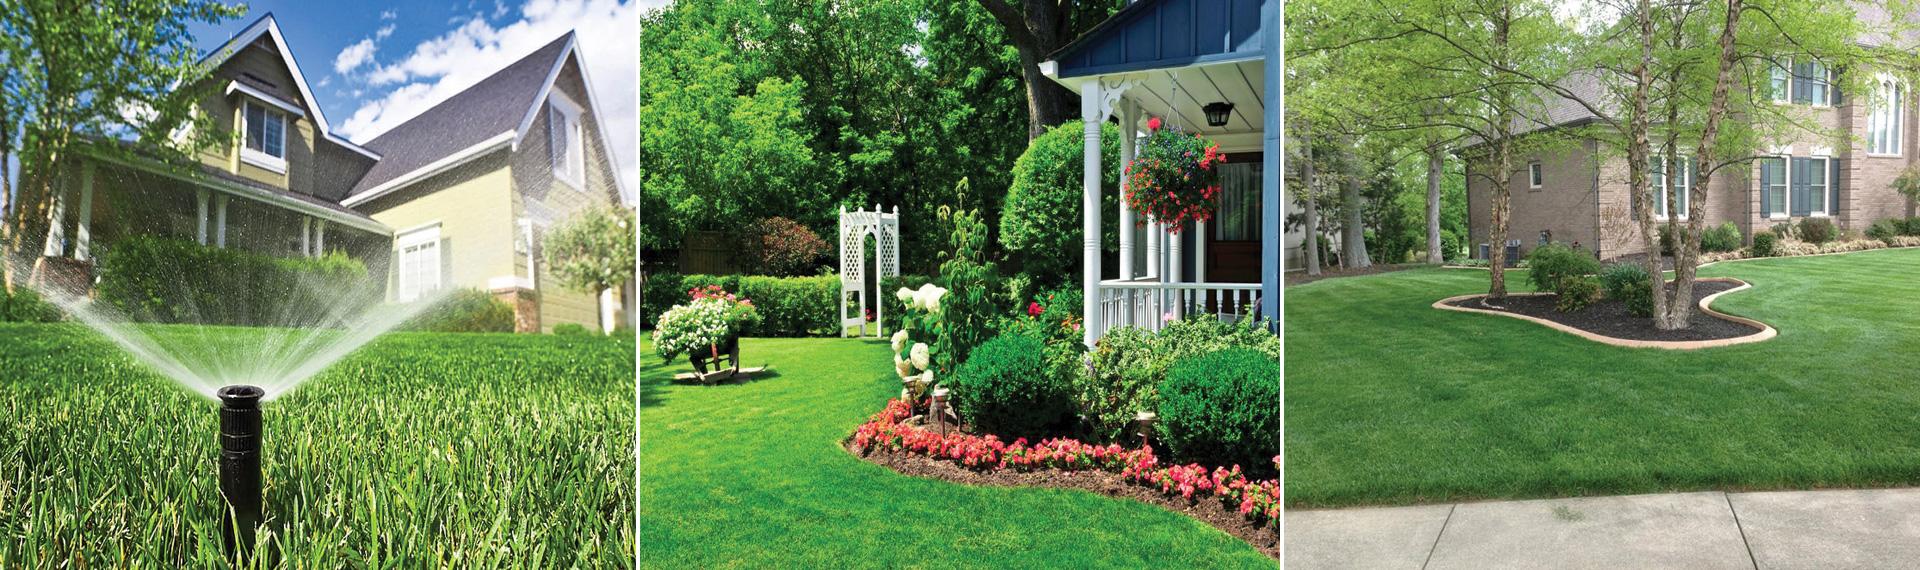 Blossom Gardening & Landscaping Snowmass Village CO